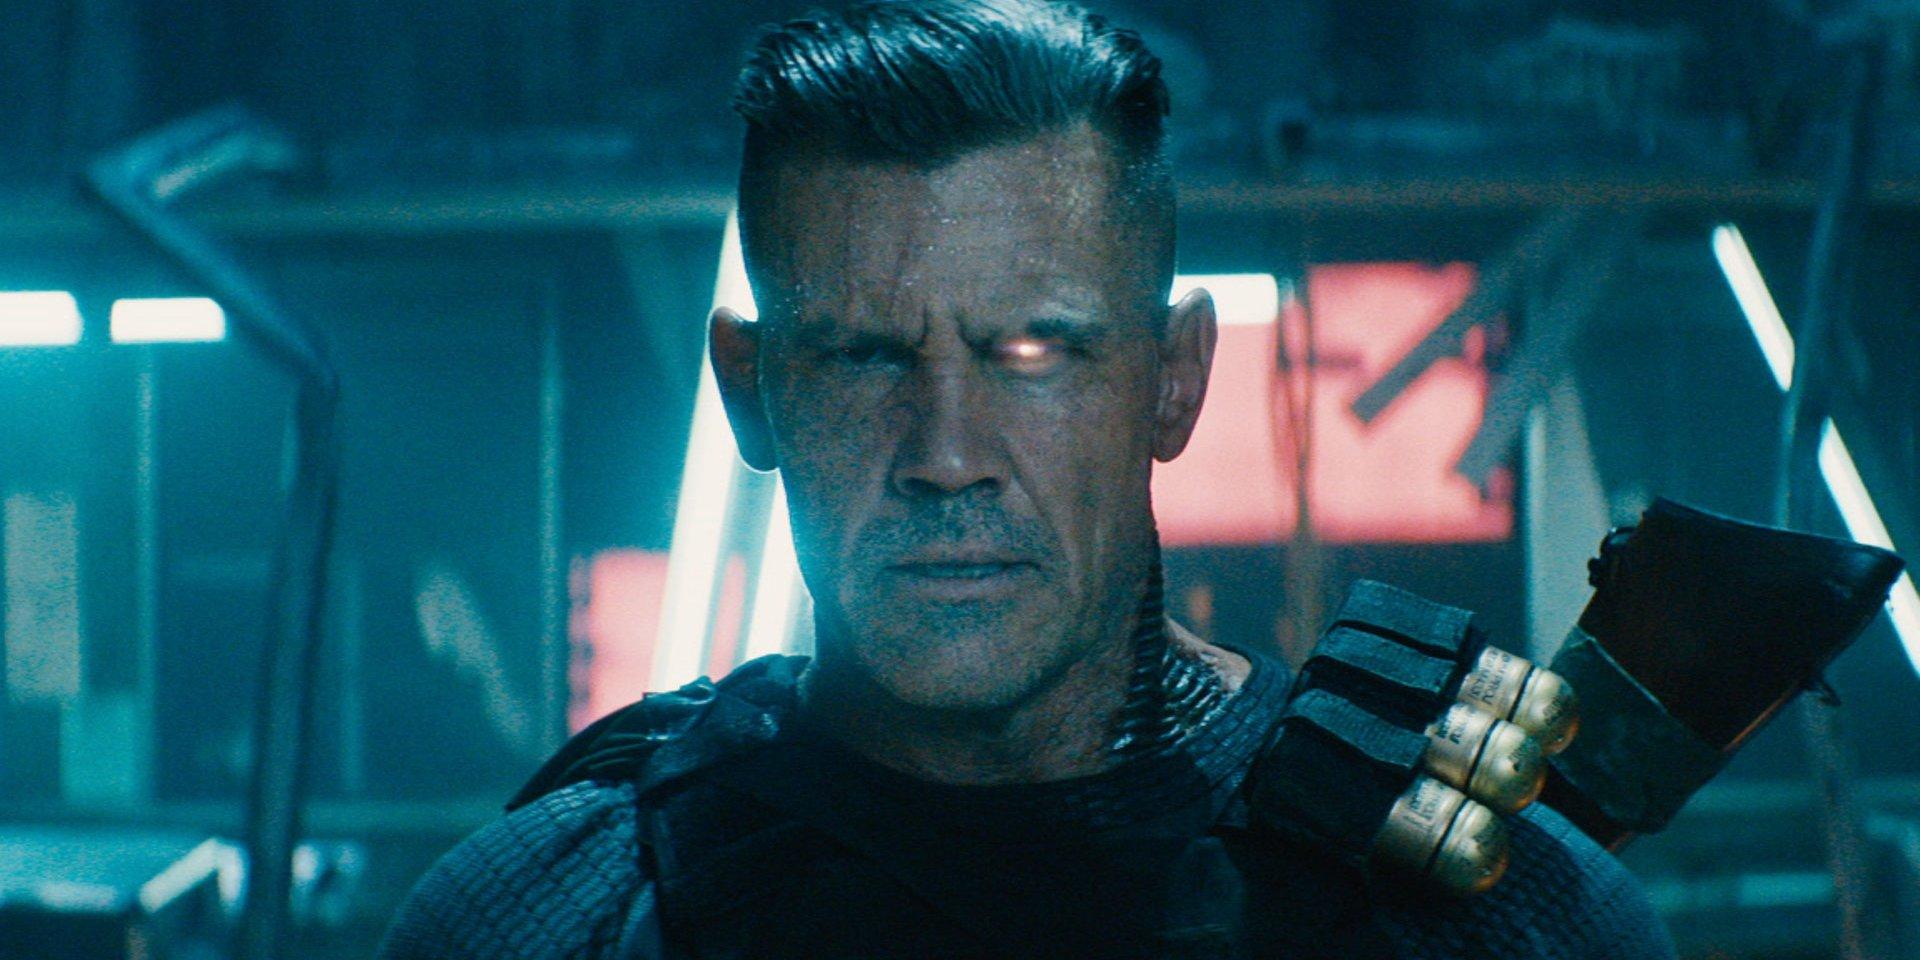 Josh Brolin Deadpool 2 review